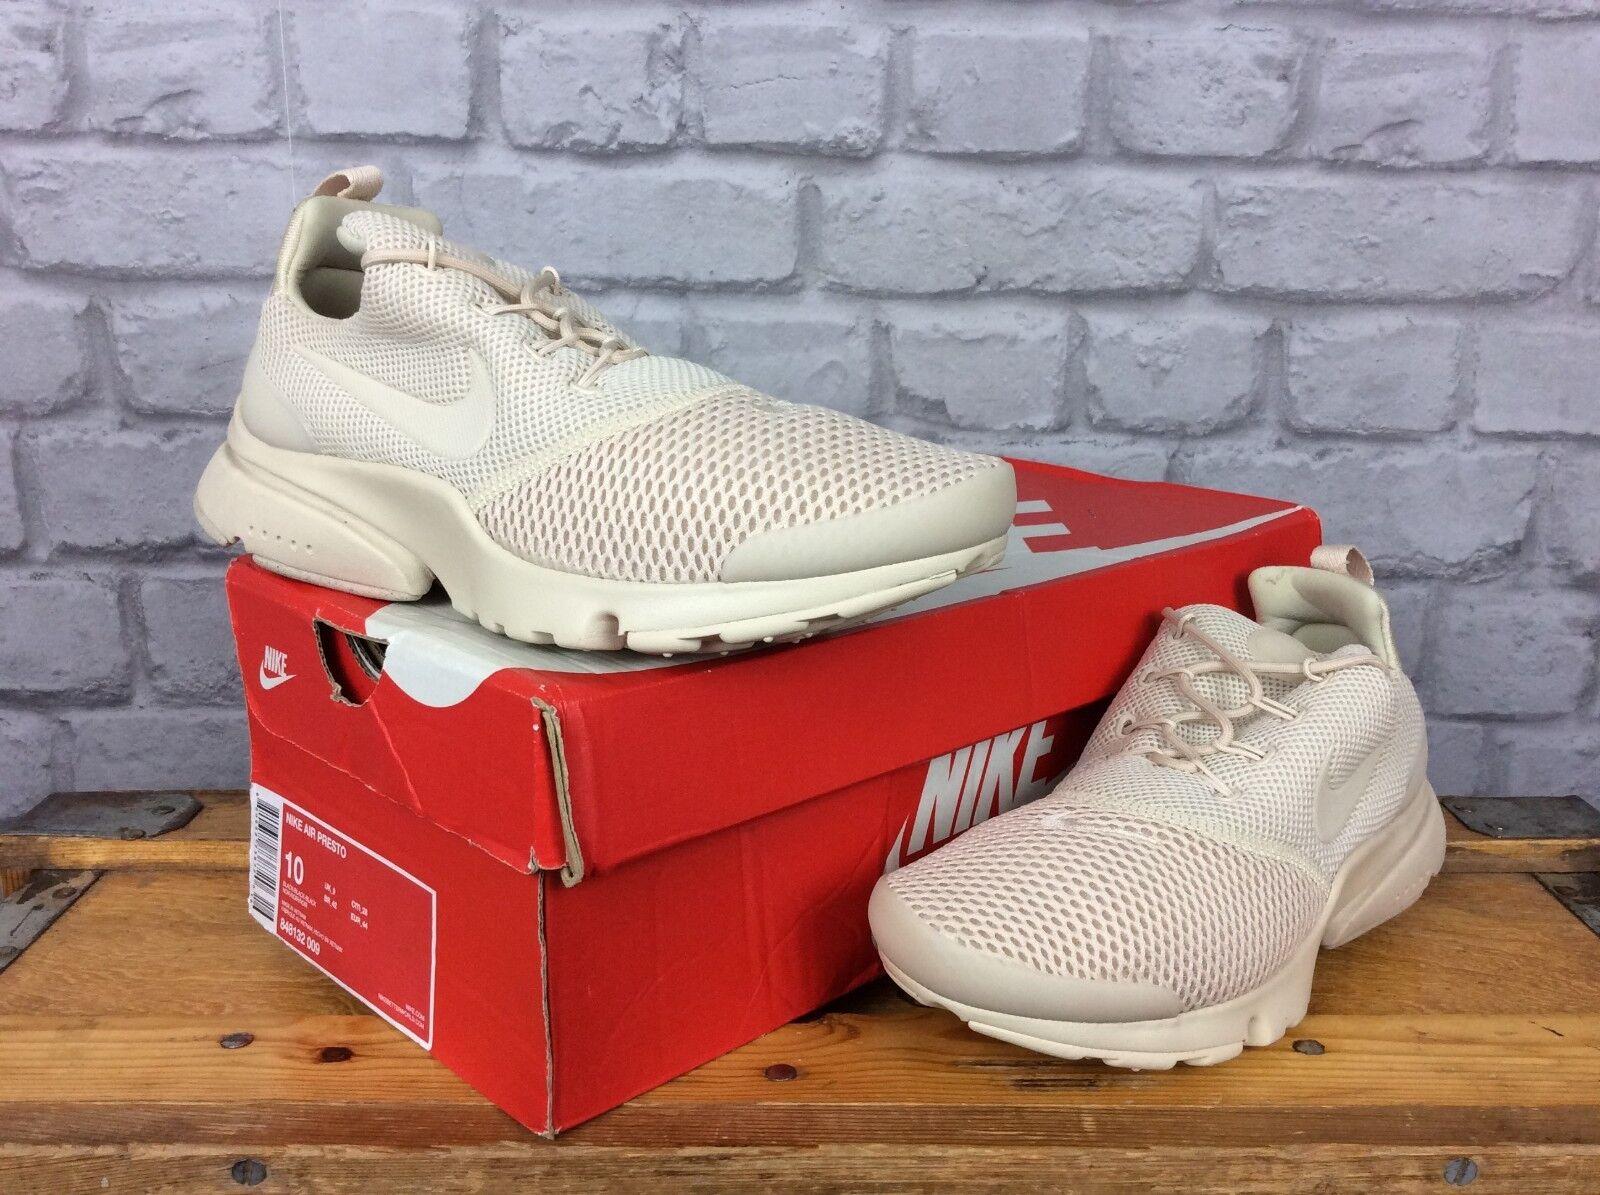 Nike Donna EU 38 presto FLY se Deserto Sabbia Marrone Scarpe da ginnastica mesh BIANCO